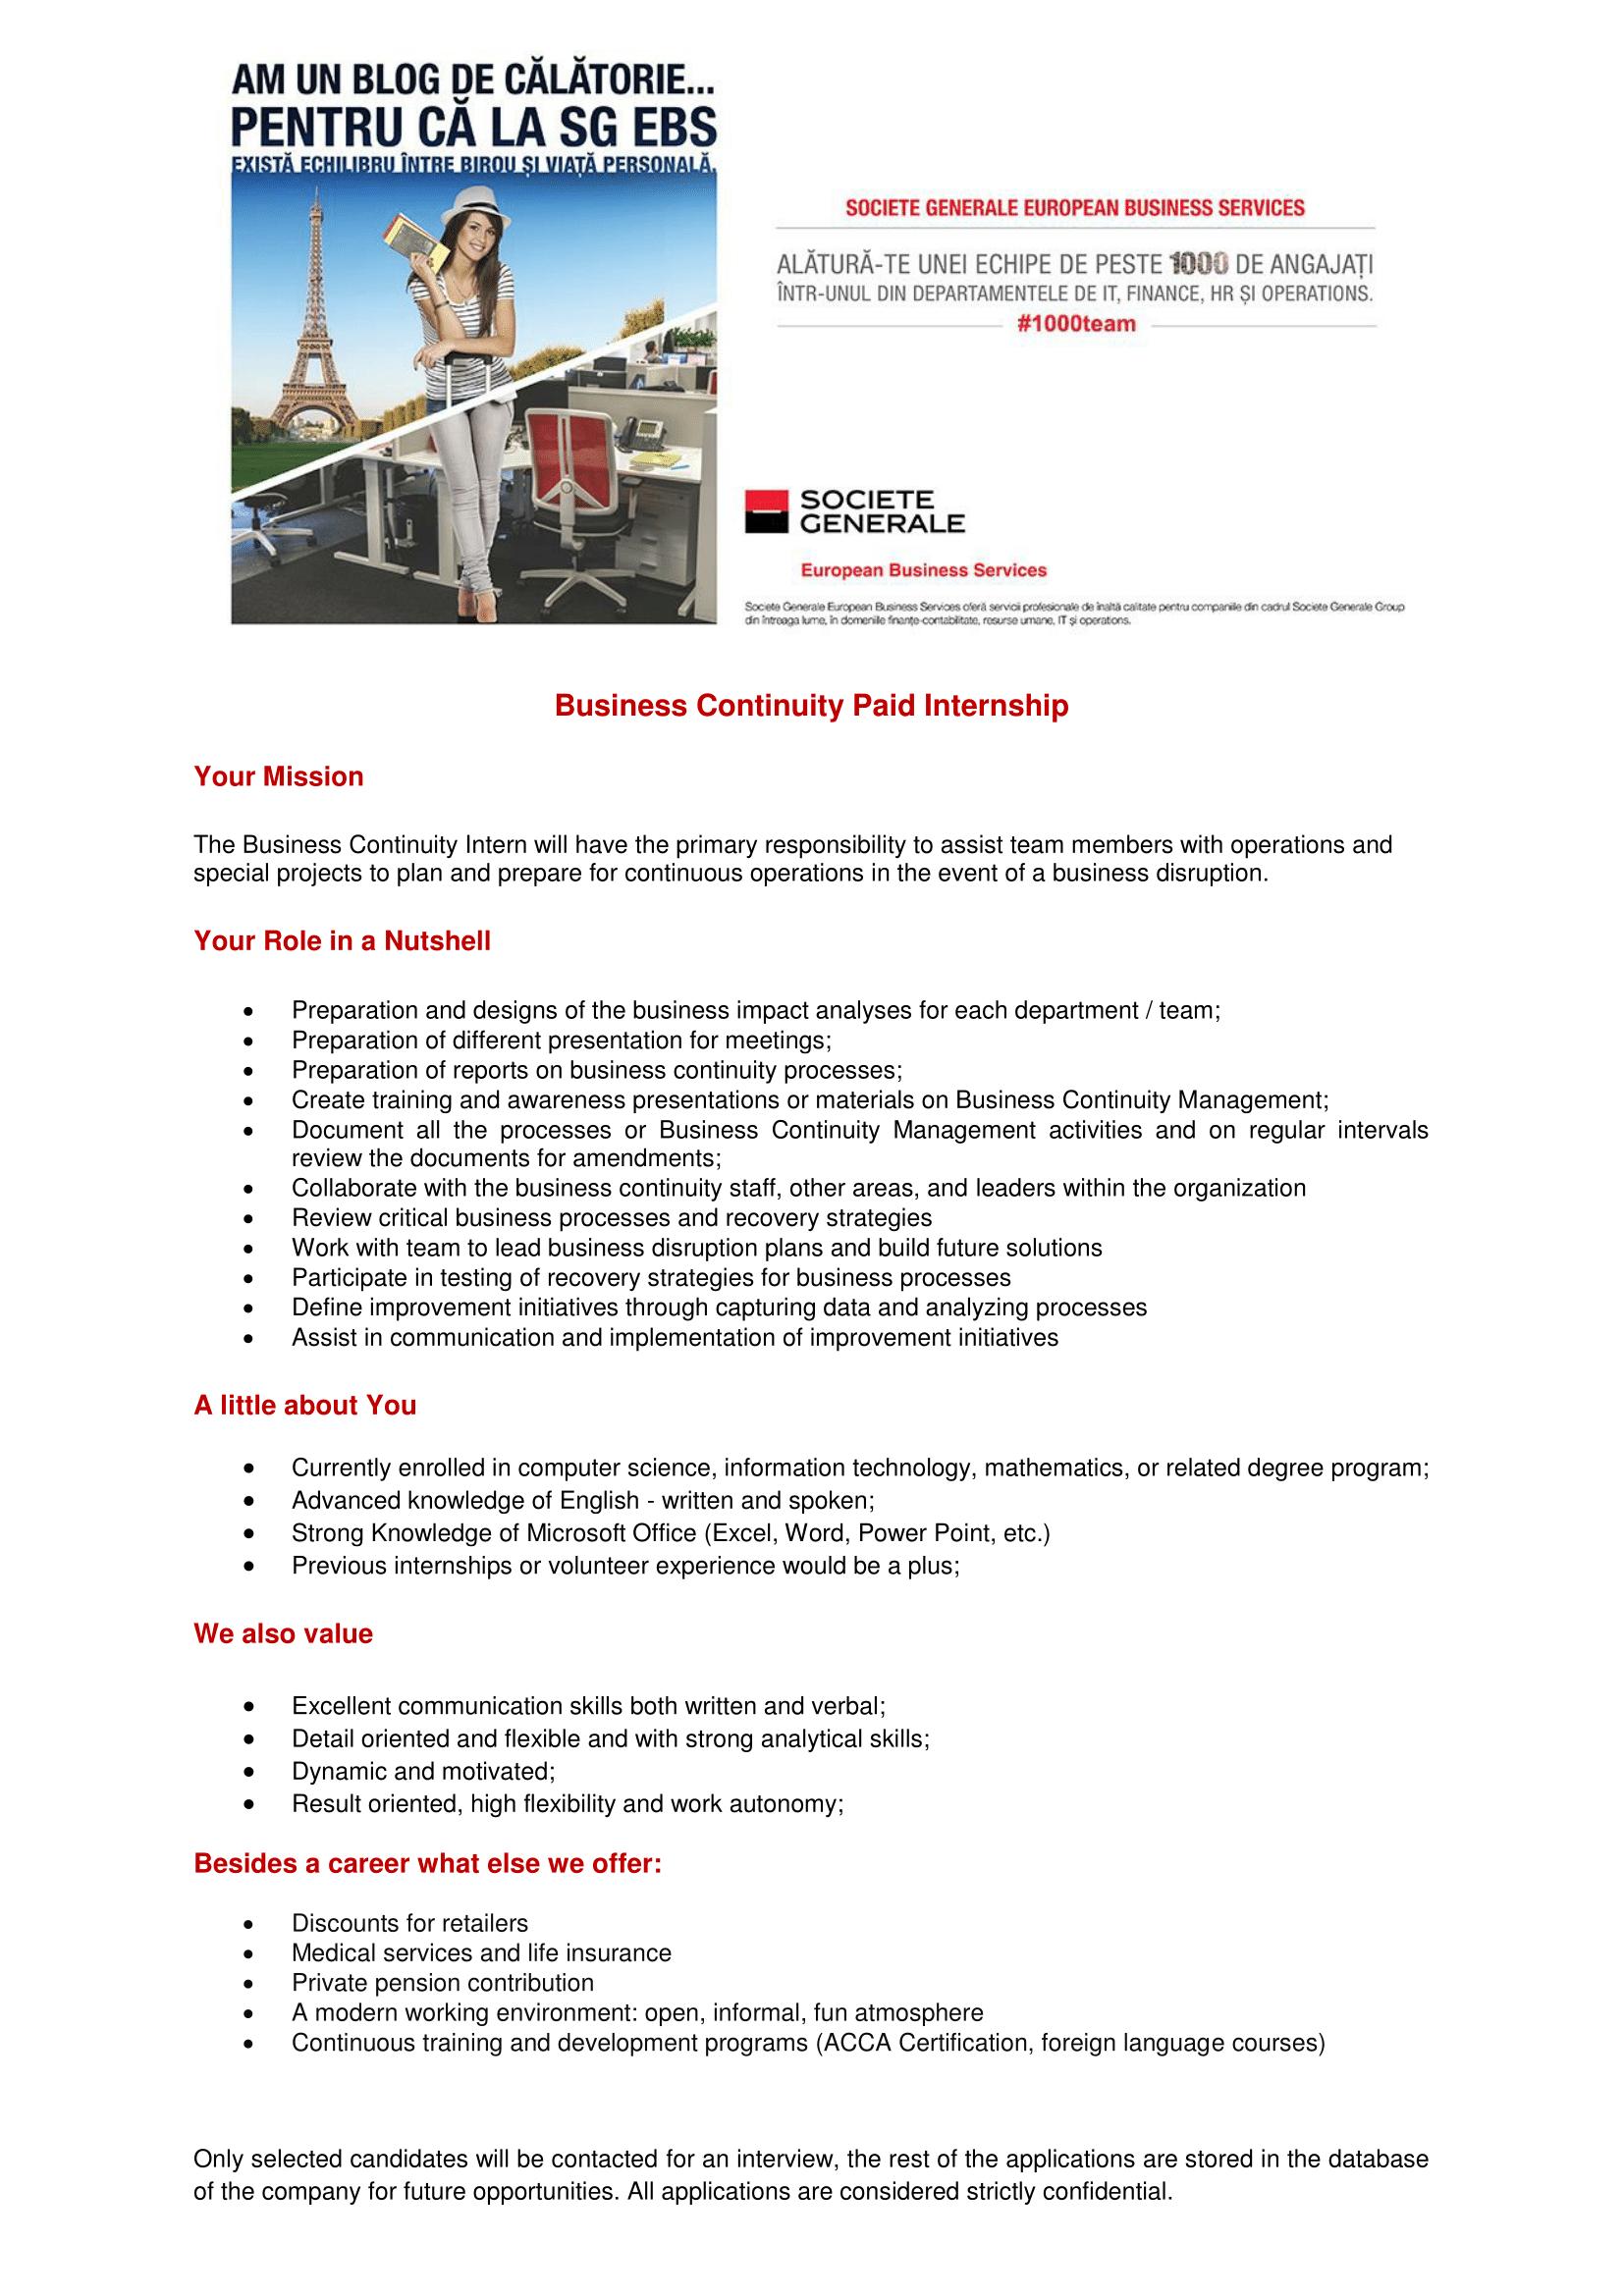 Business Continuity Paid Internship-1